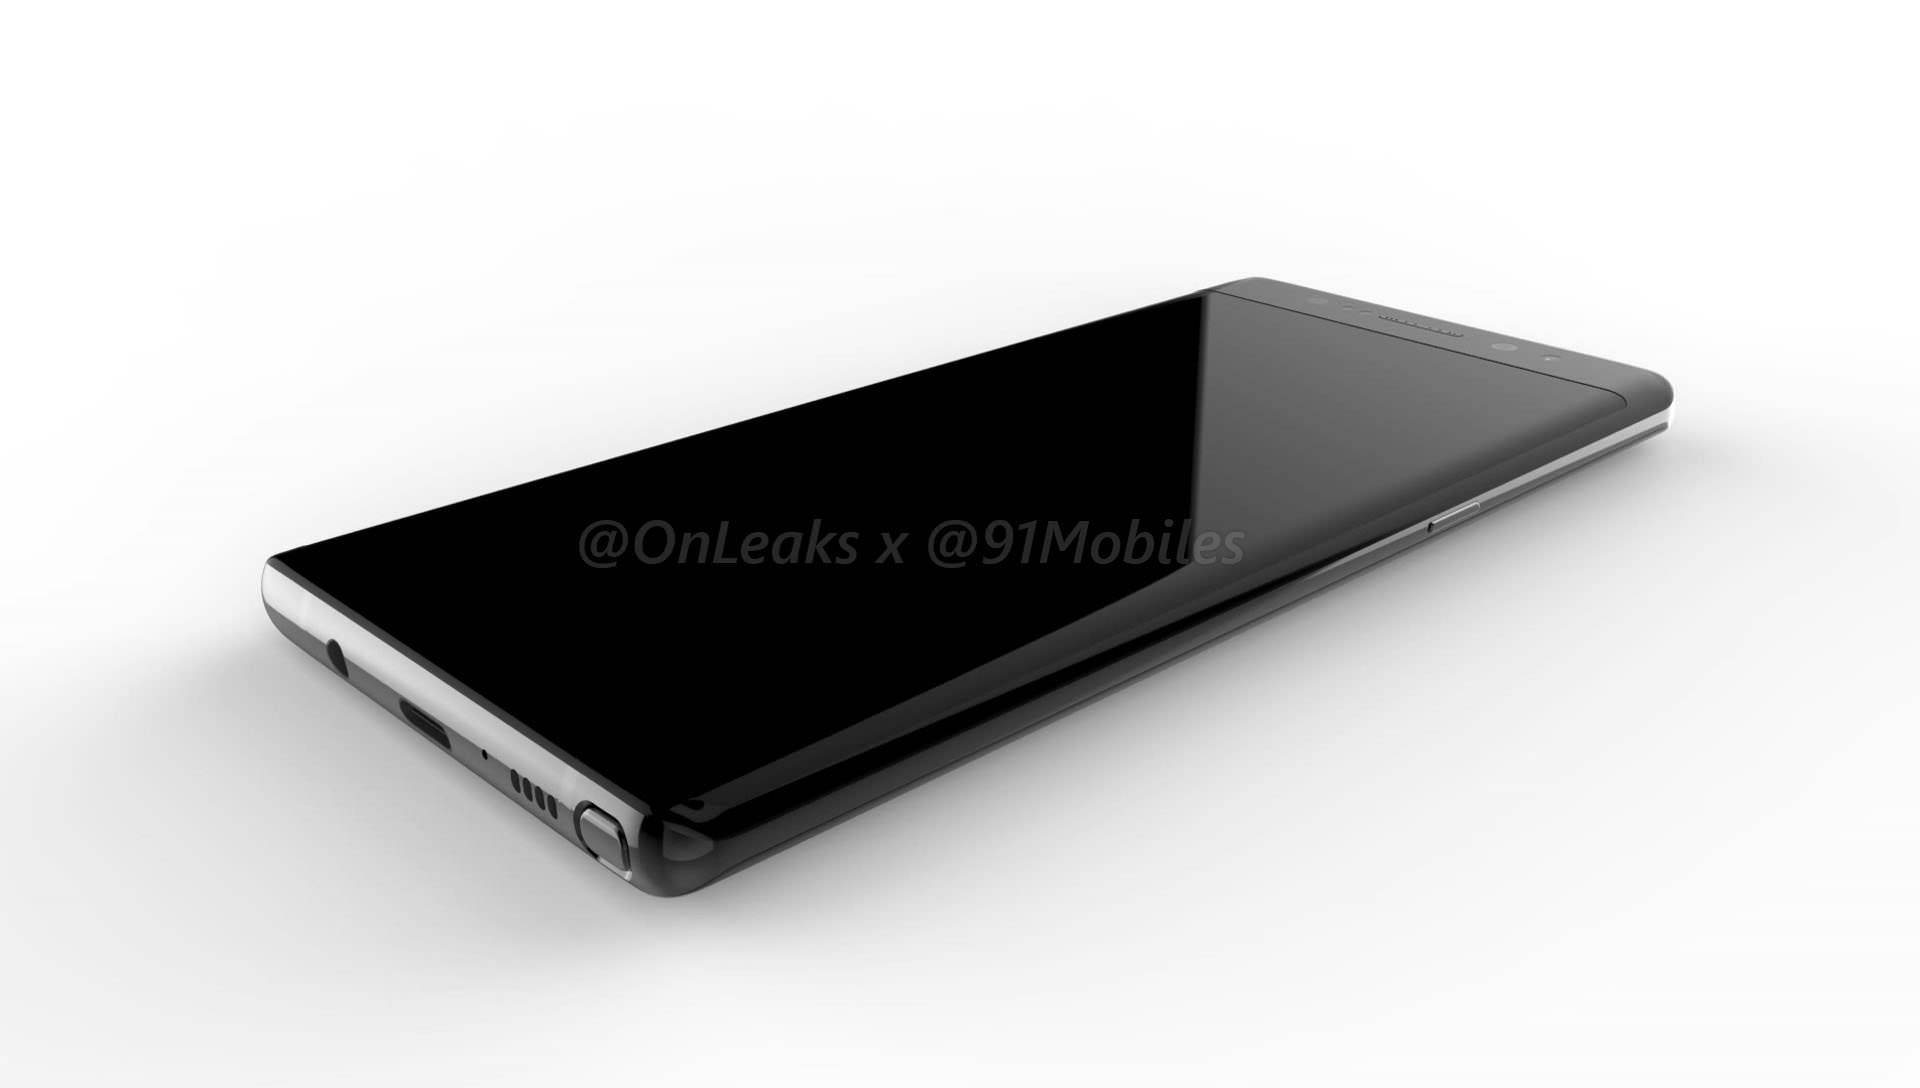 Samsung confirme la présentation du Galaxy Note 8